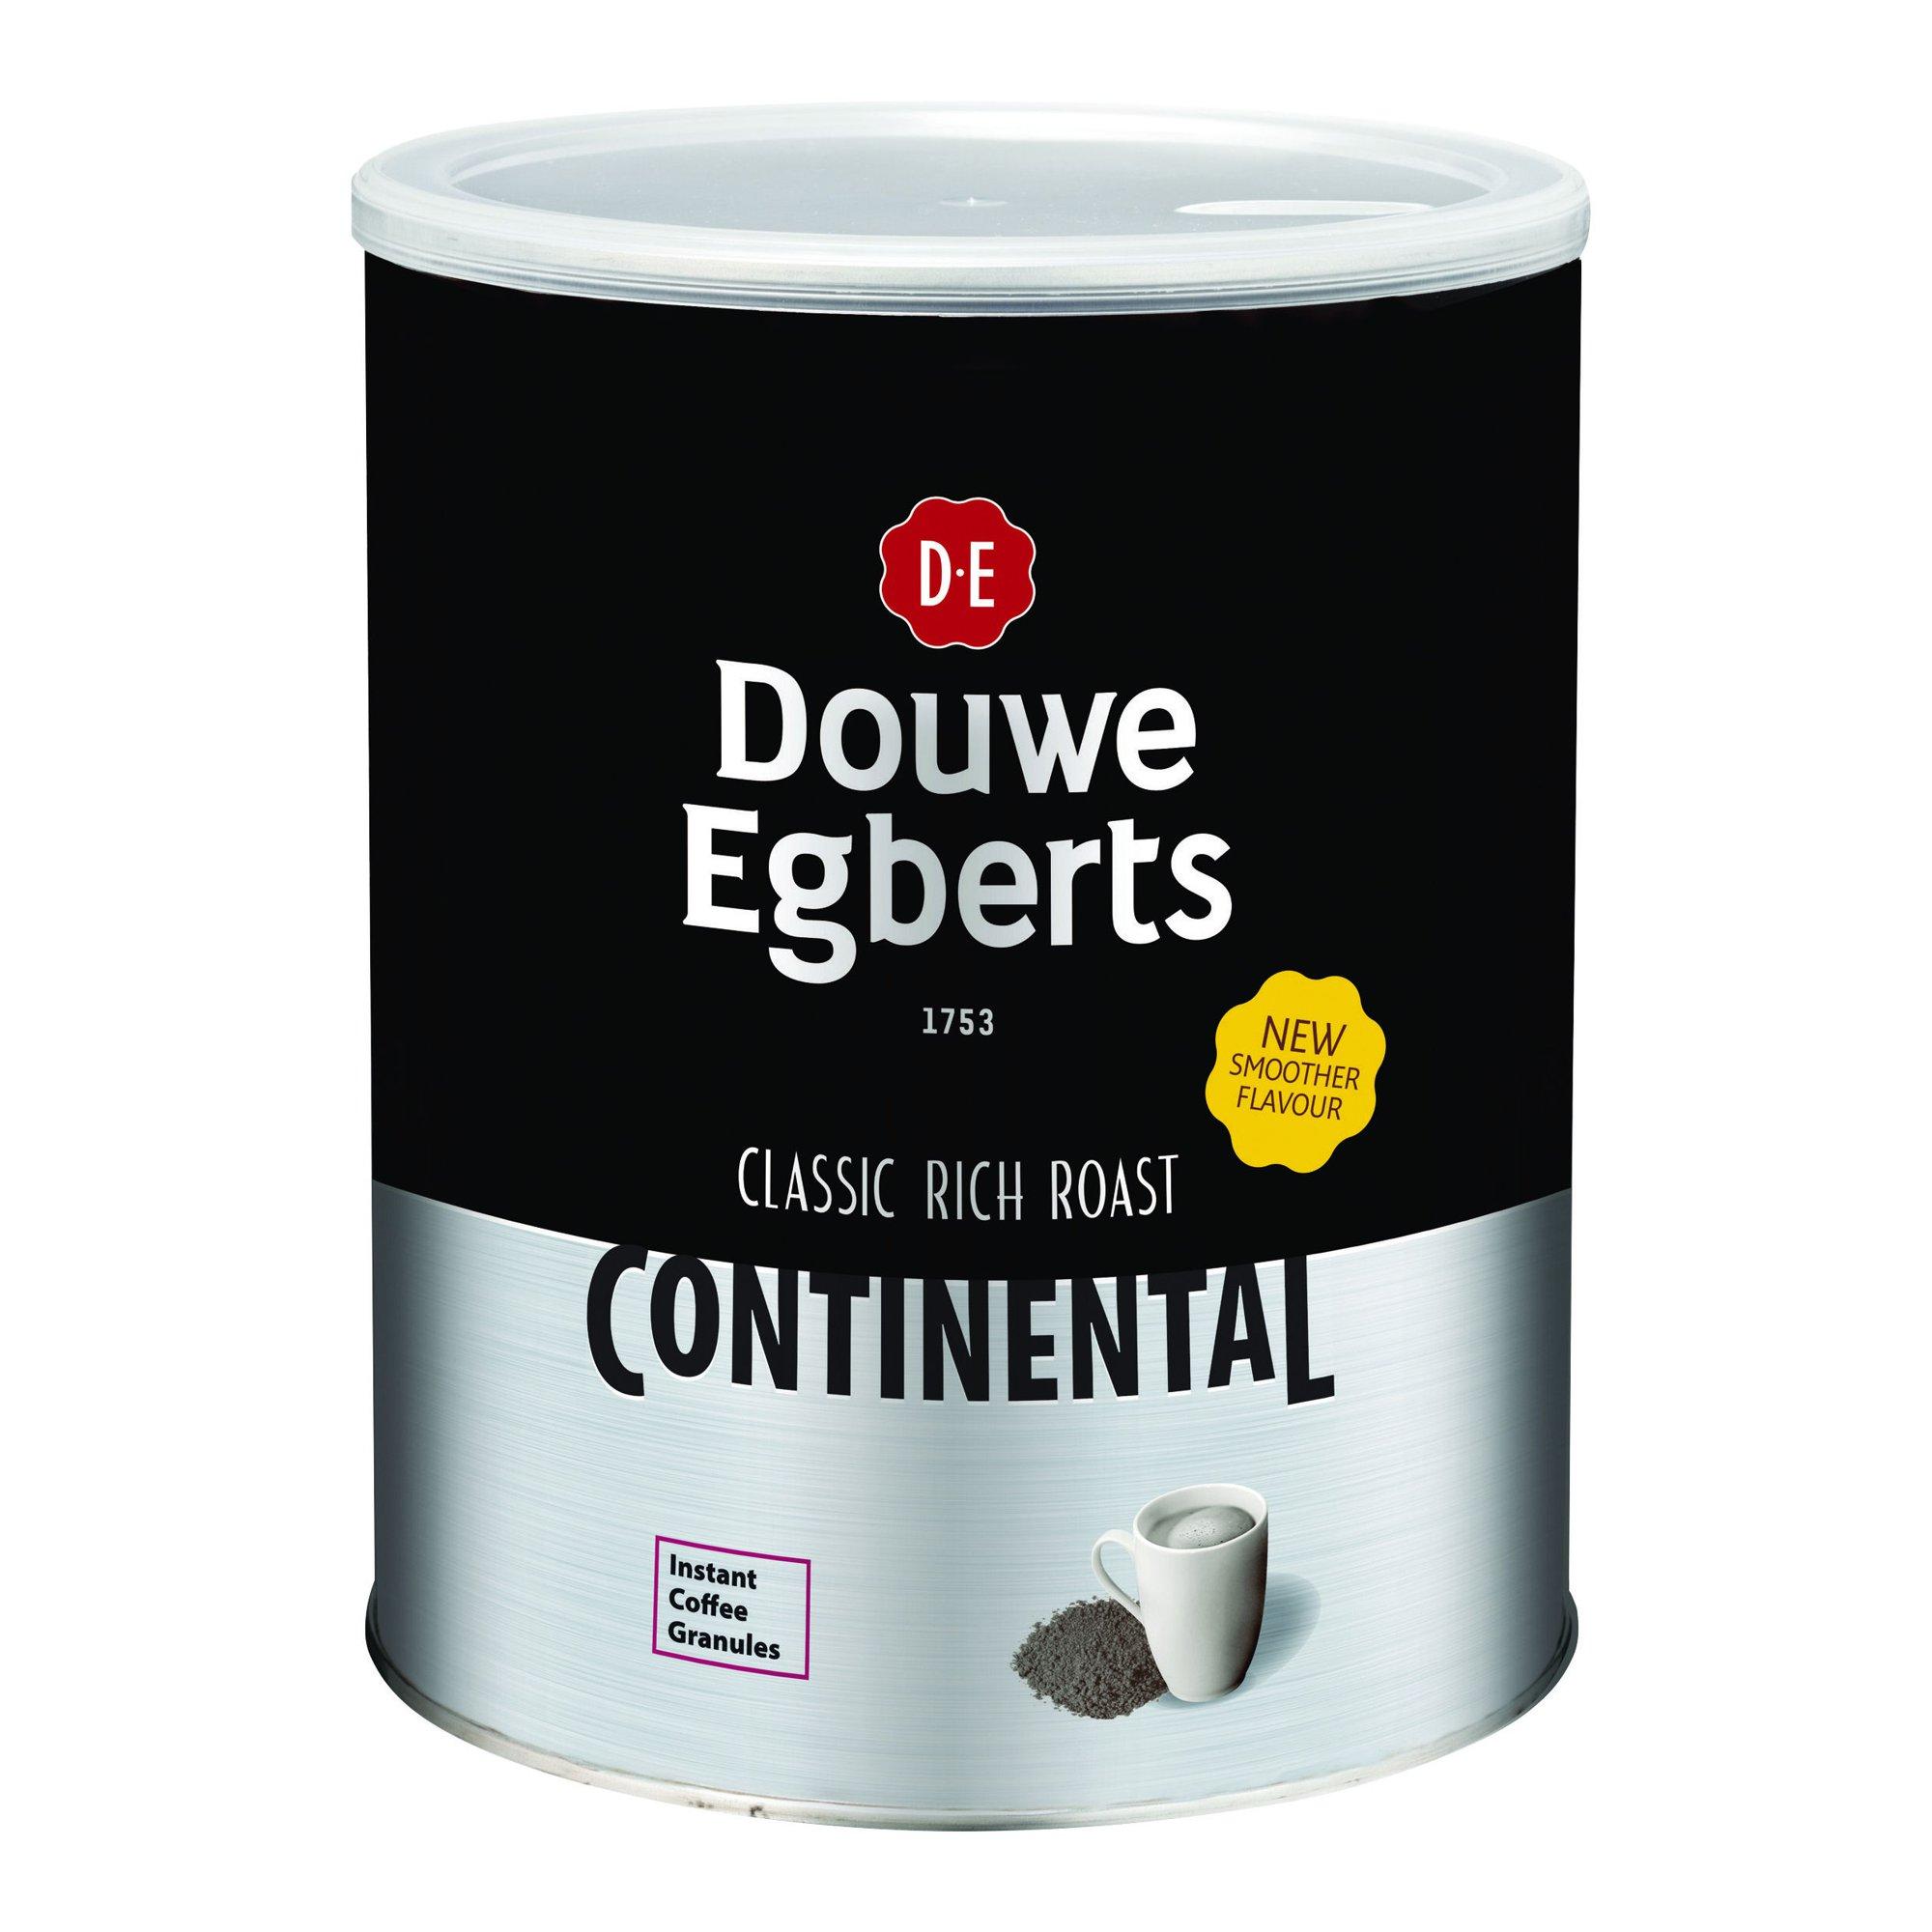 Douwe Egberts Continental Rich Roast Coffee Tin 750g